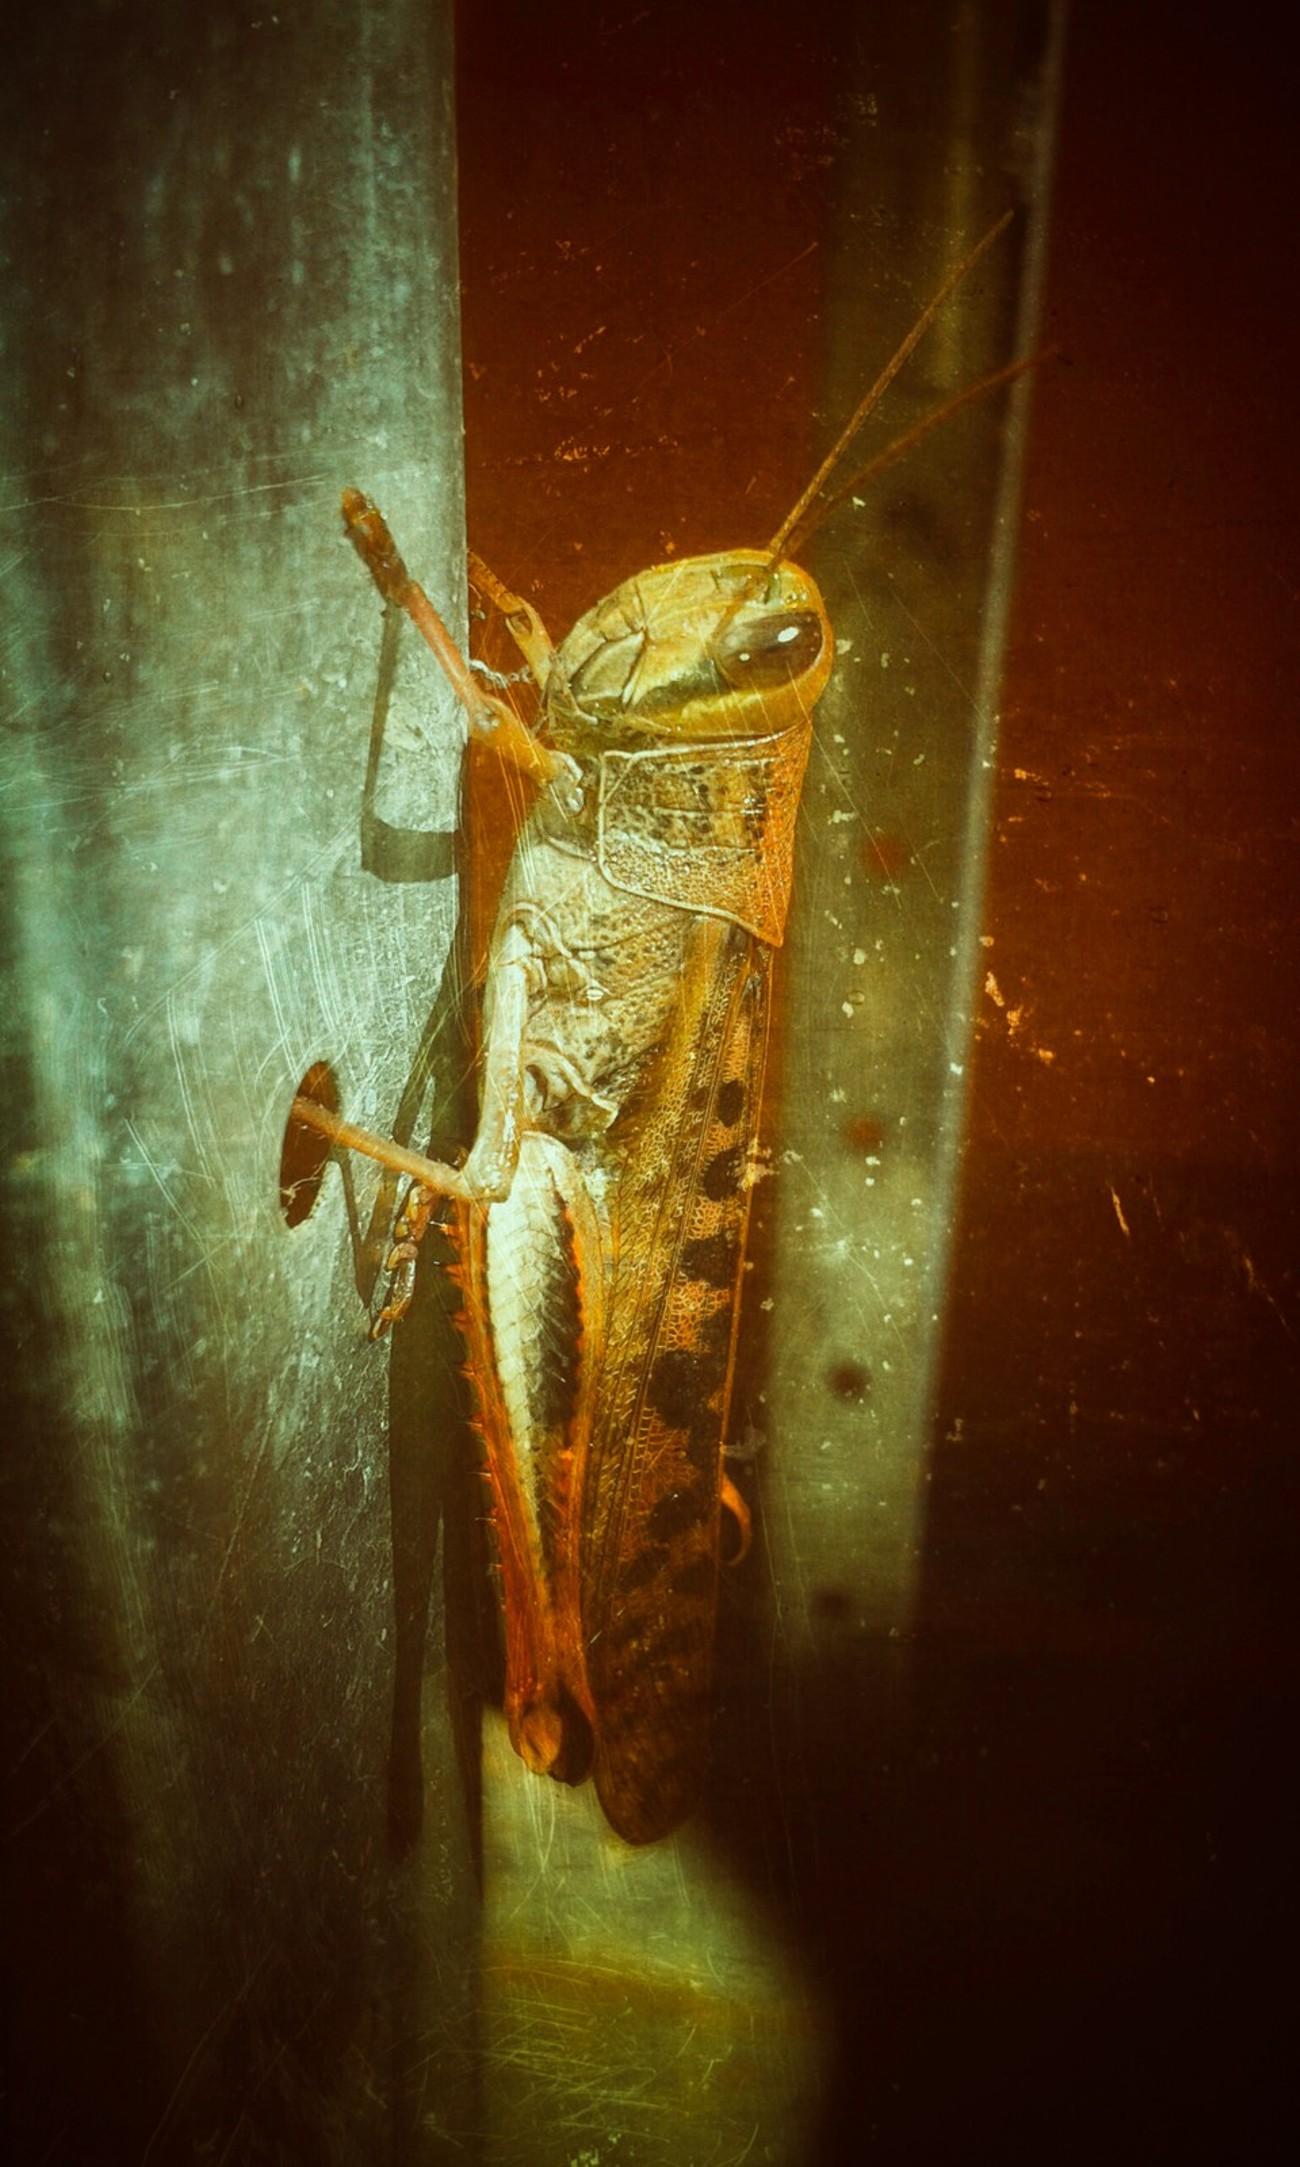 Grasshoppper